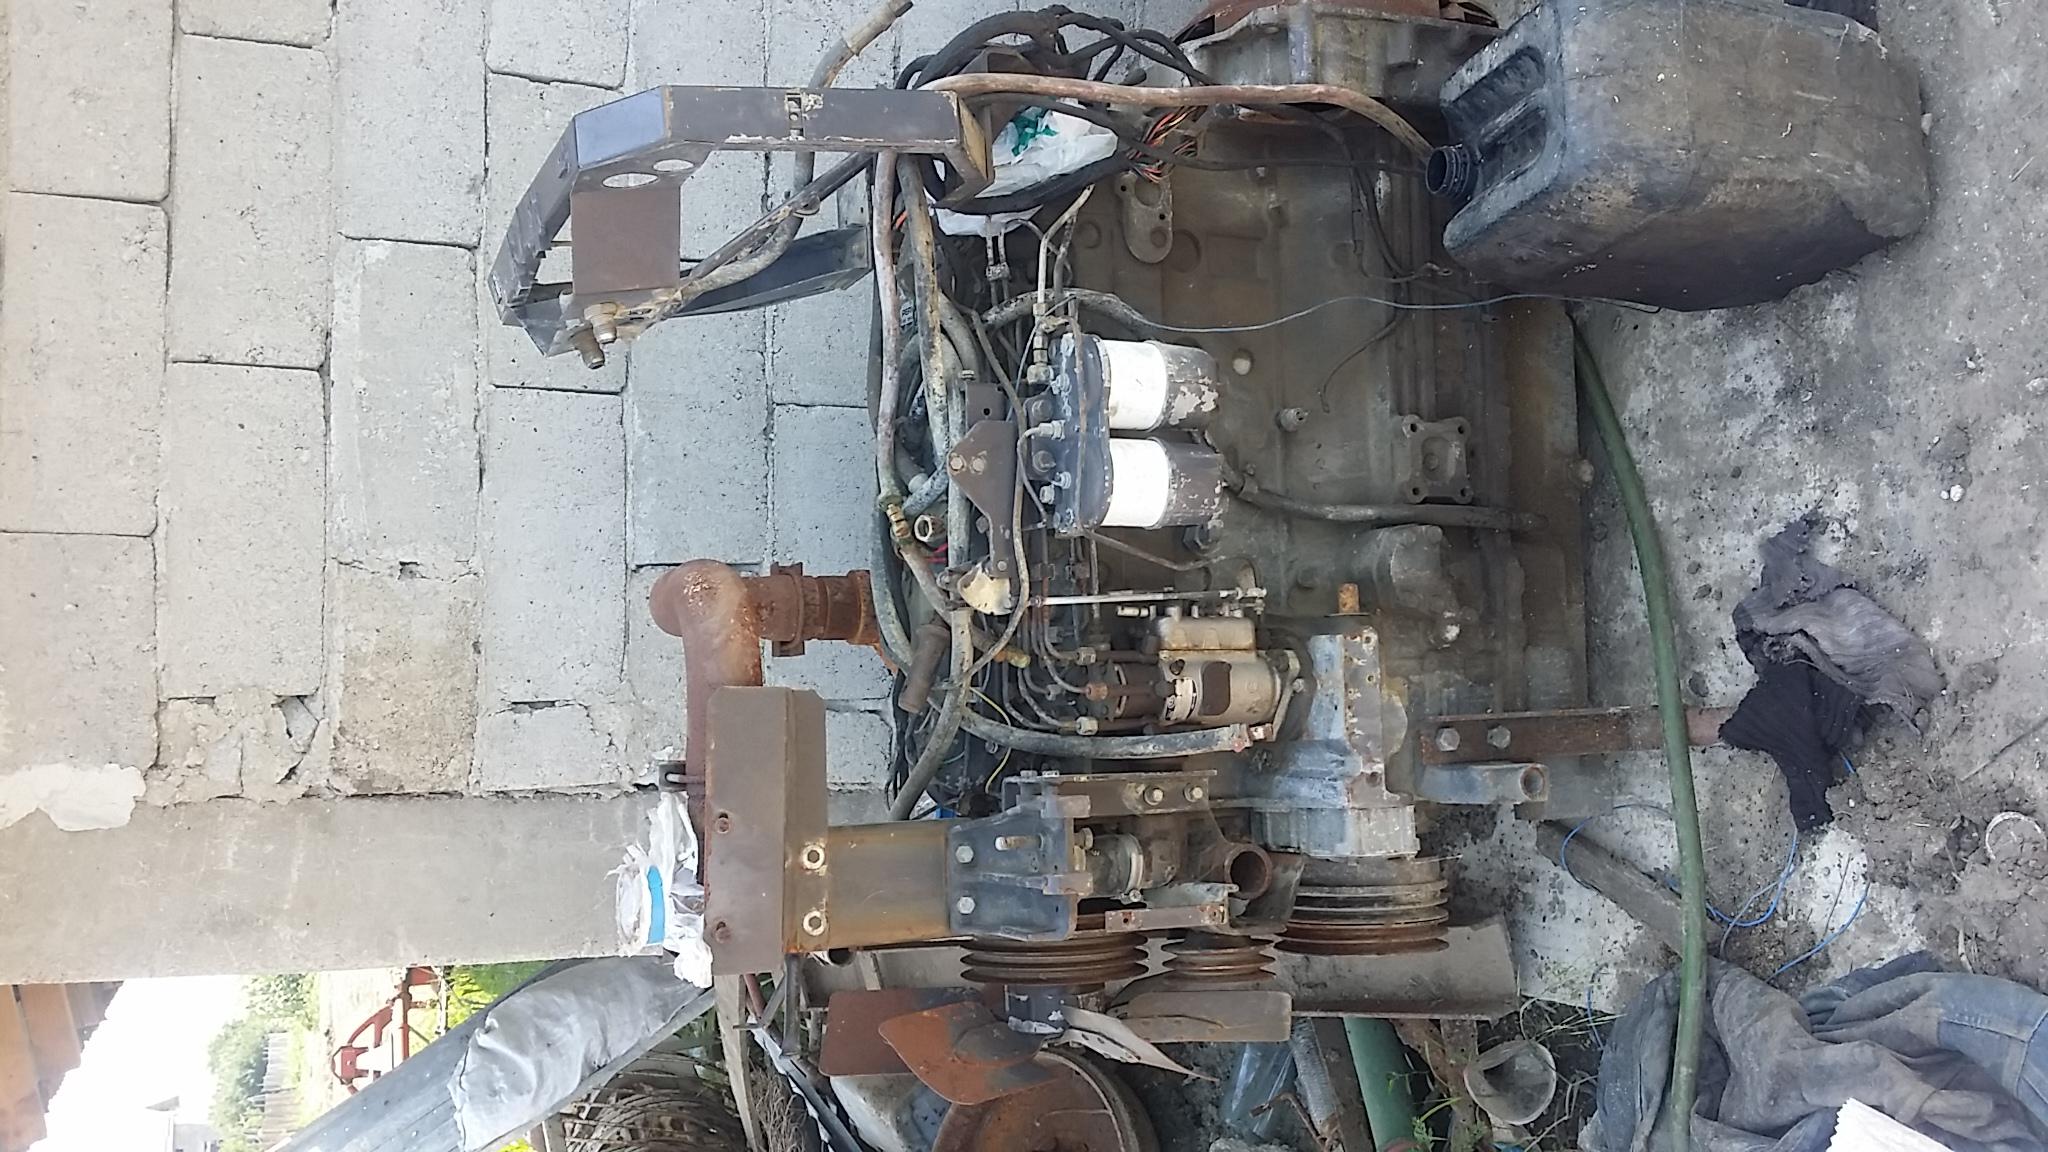 Vand motor perkins pentru tractor massey ferguson 130 cai